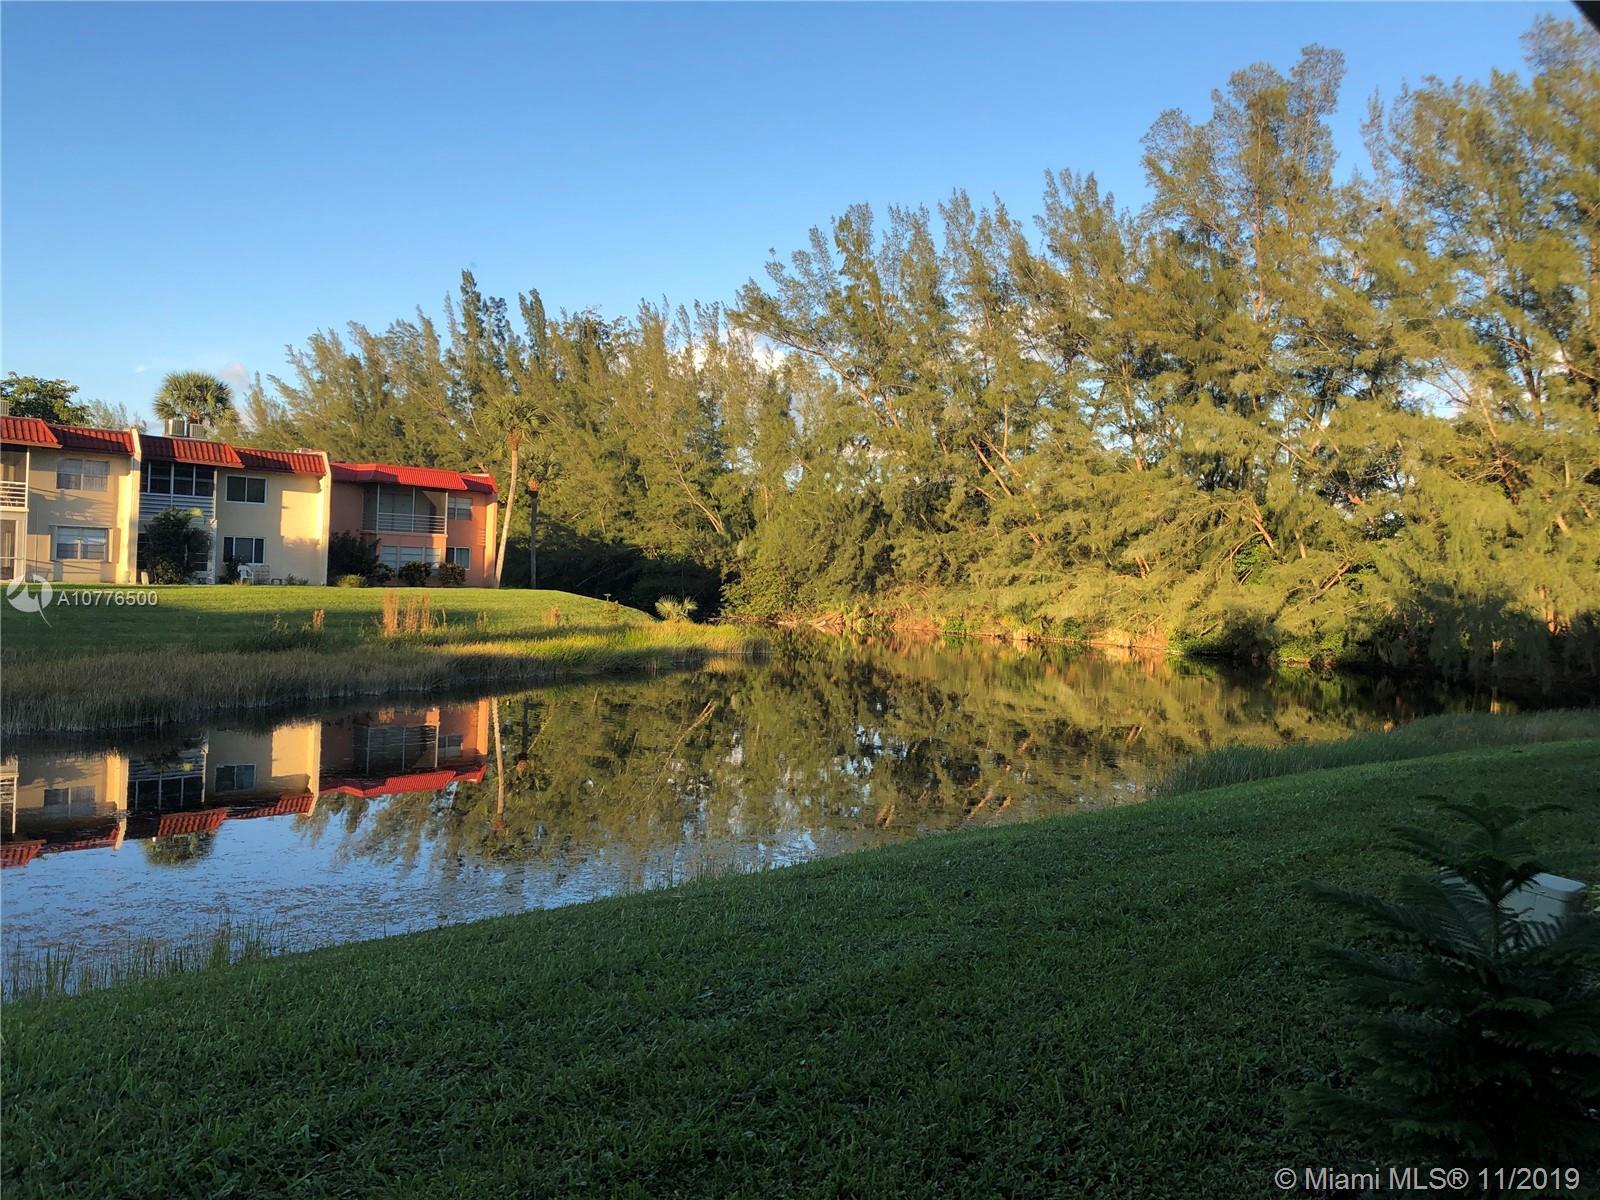 229 Lake Frances Dr #229, West Palm Beach, FL 33411 - West Palm Beach, FL real estate listing